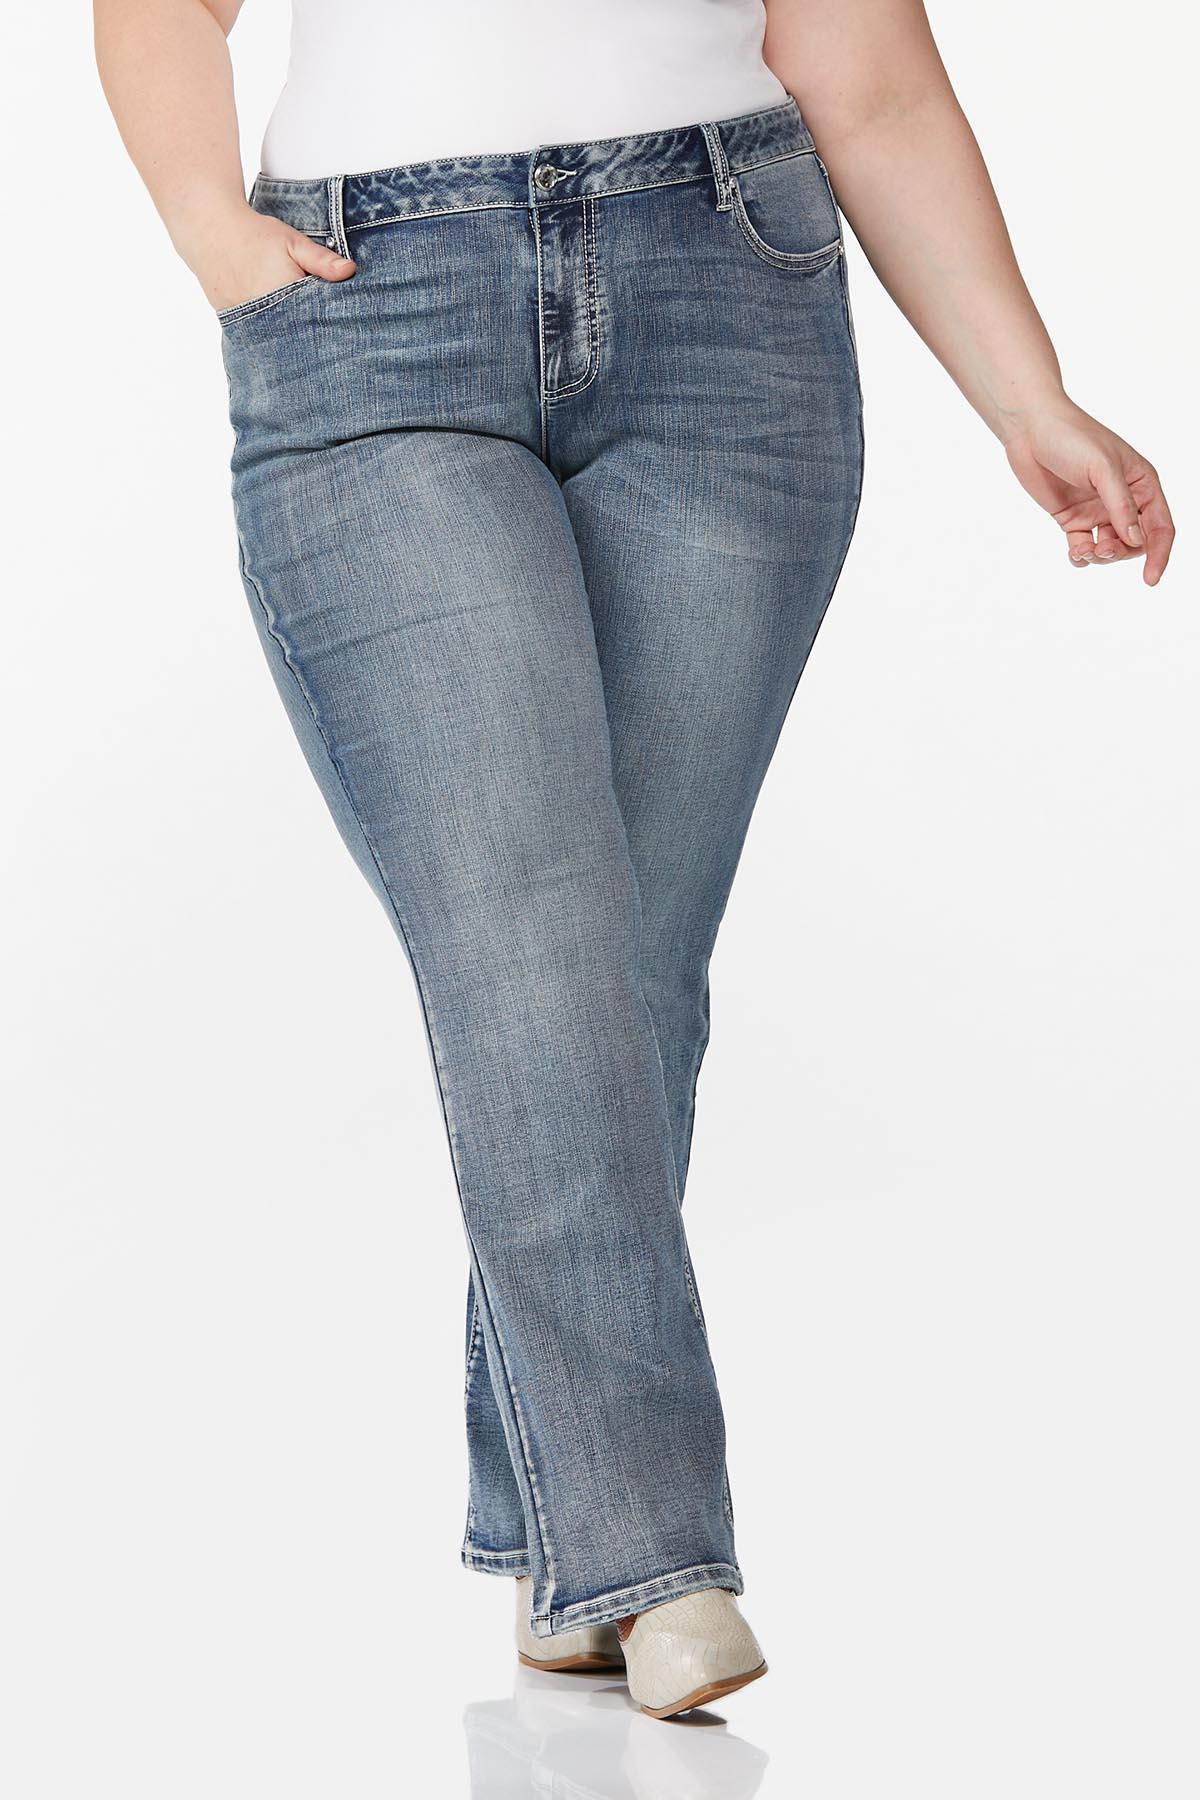 Plus Size Embellished Curvy Jeans (Item #44726524)